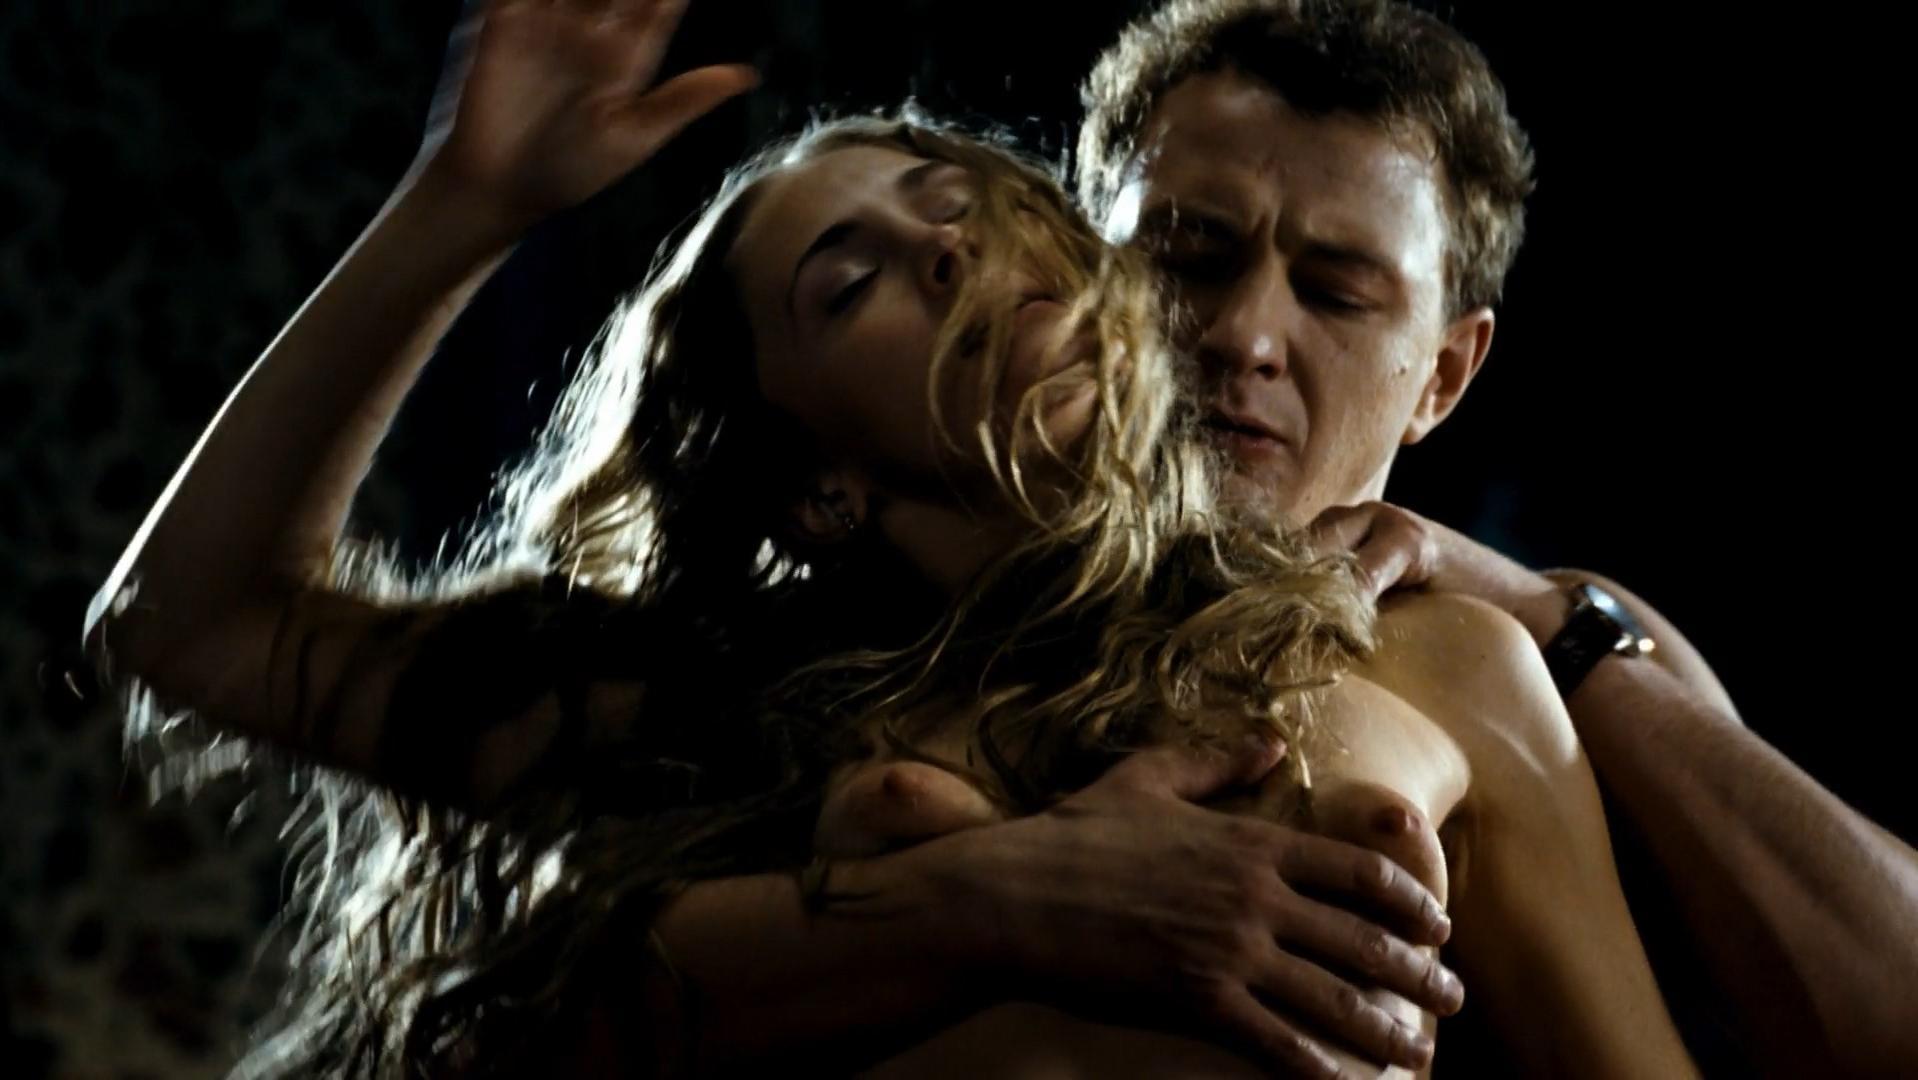 Anna Kazuchic nude - Julenka (2009)